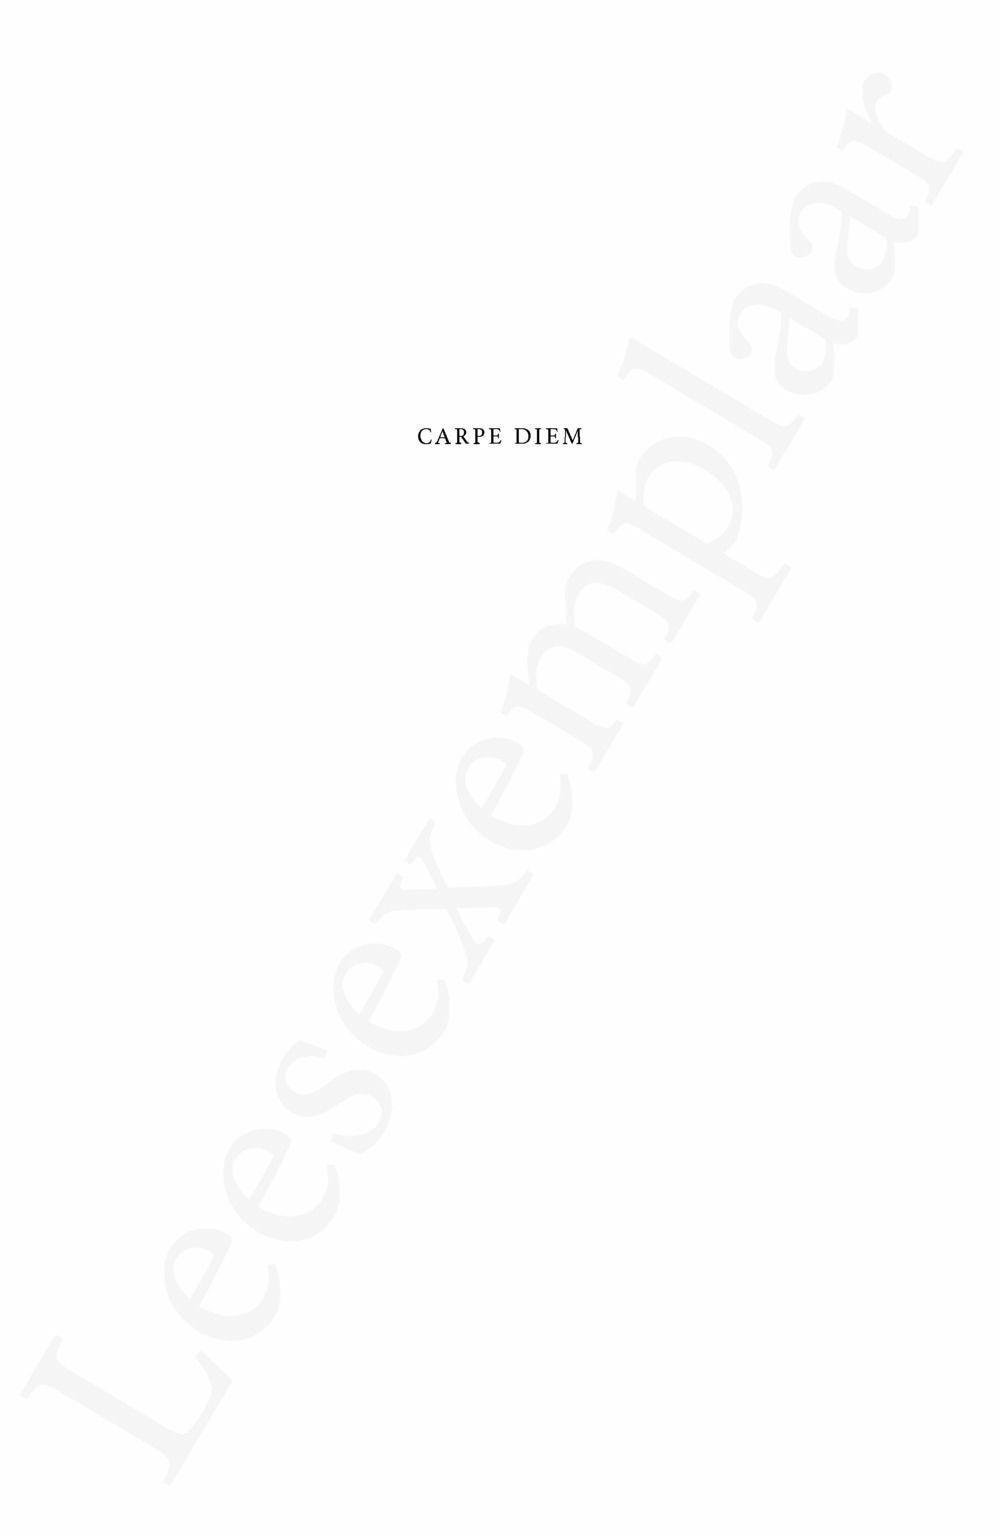 Preview: Carpe Diem